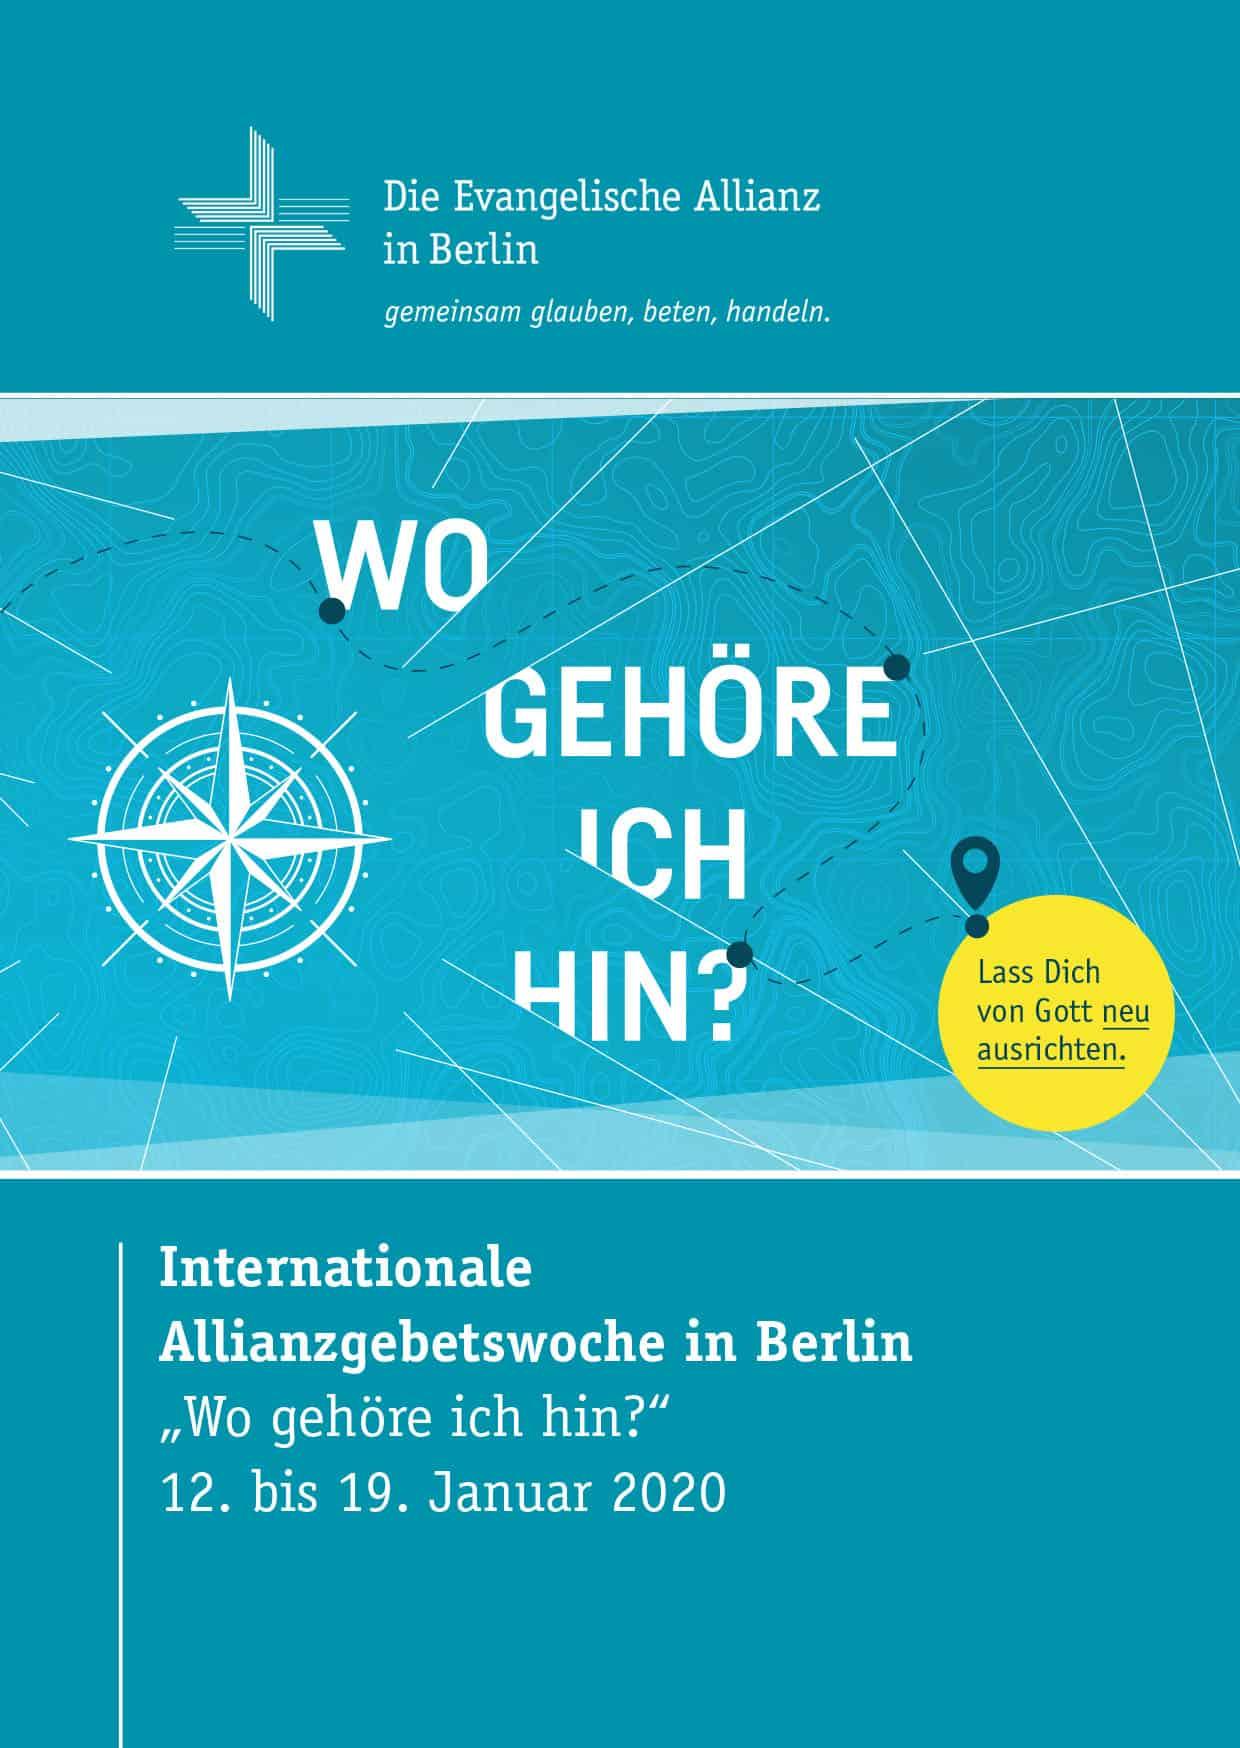 Ev. Allianz Berlin